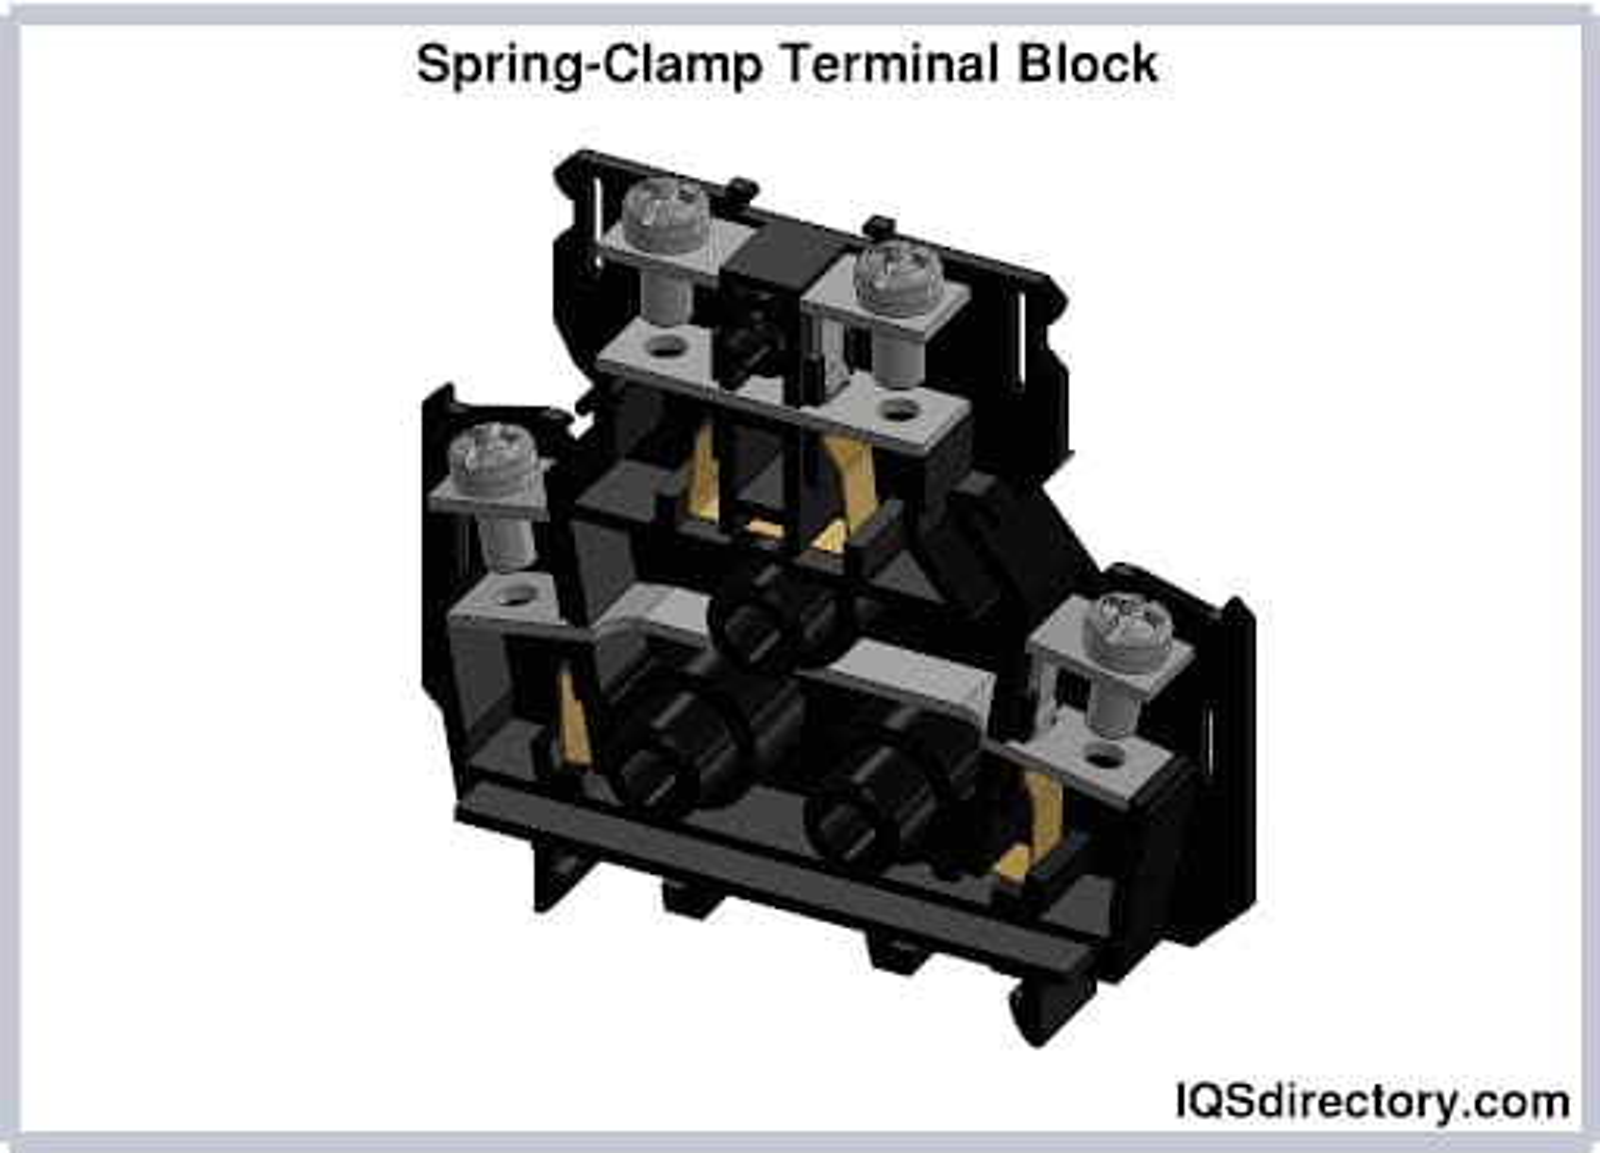 Spring-Clamp Terminal Block